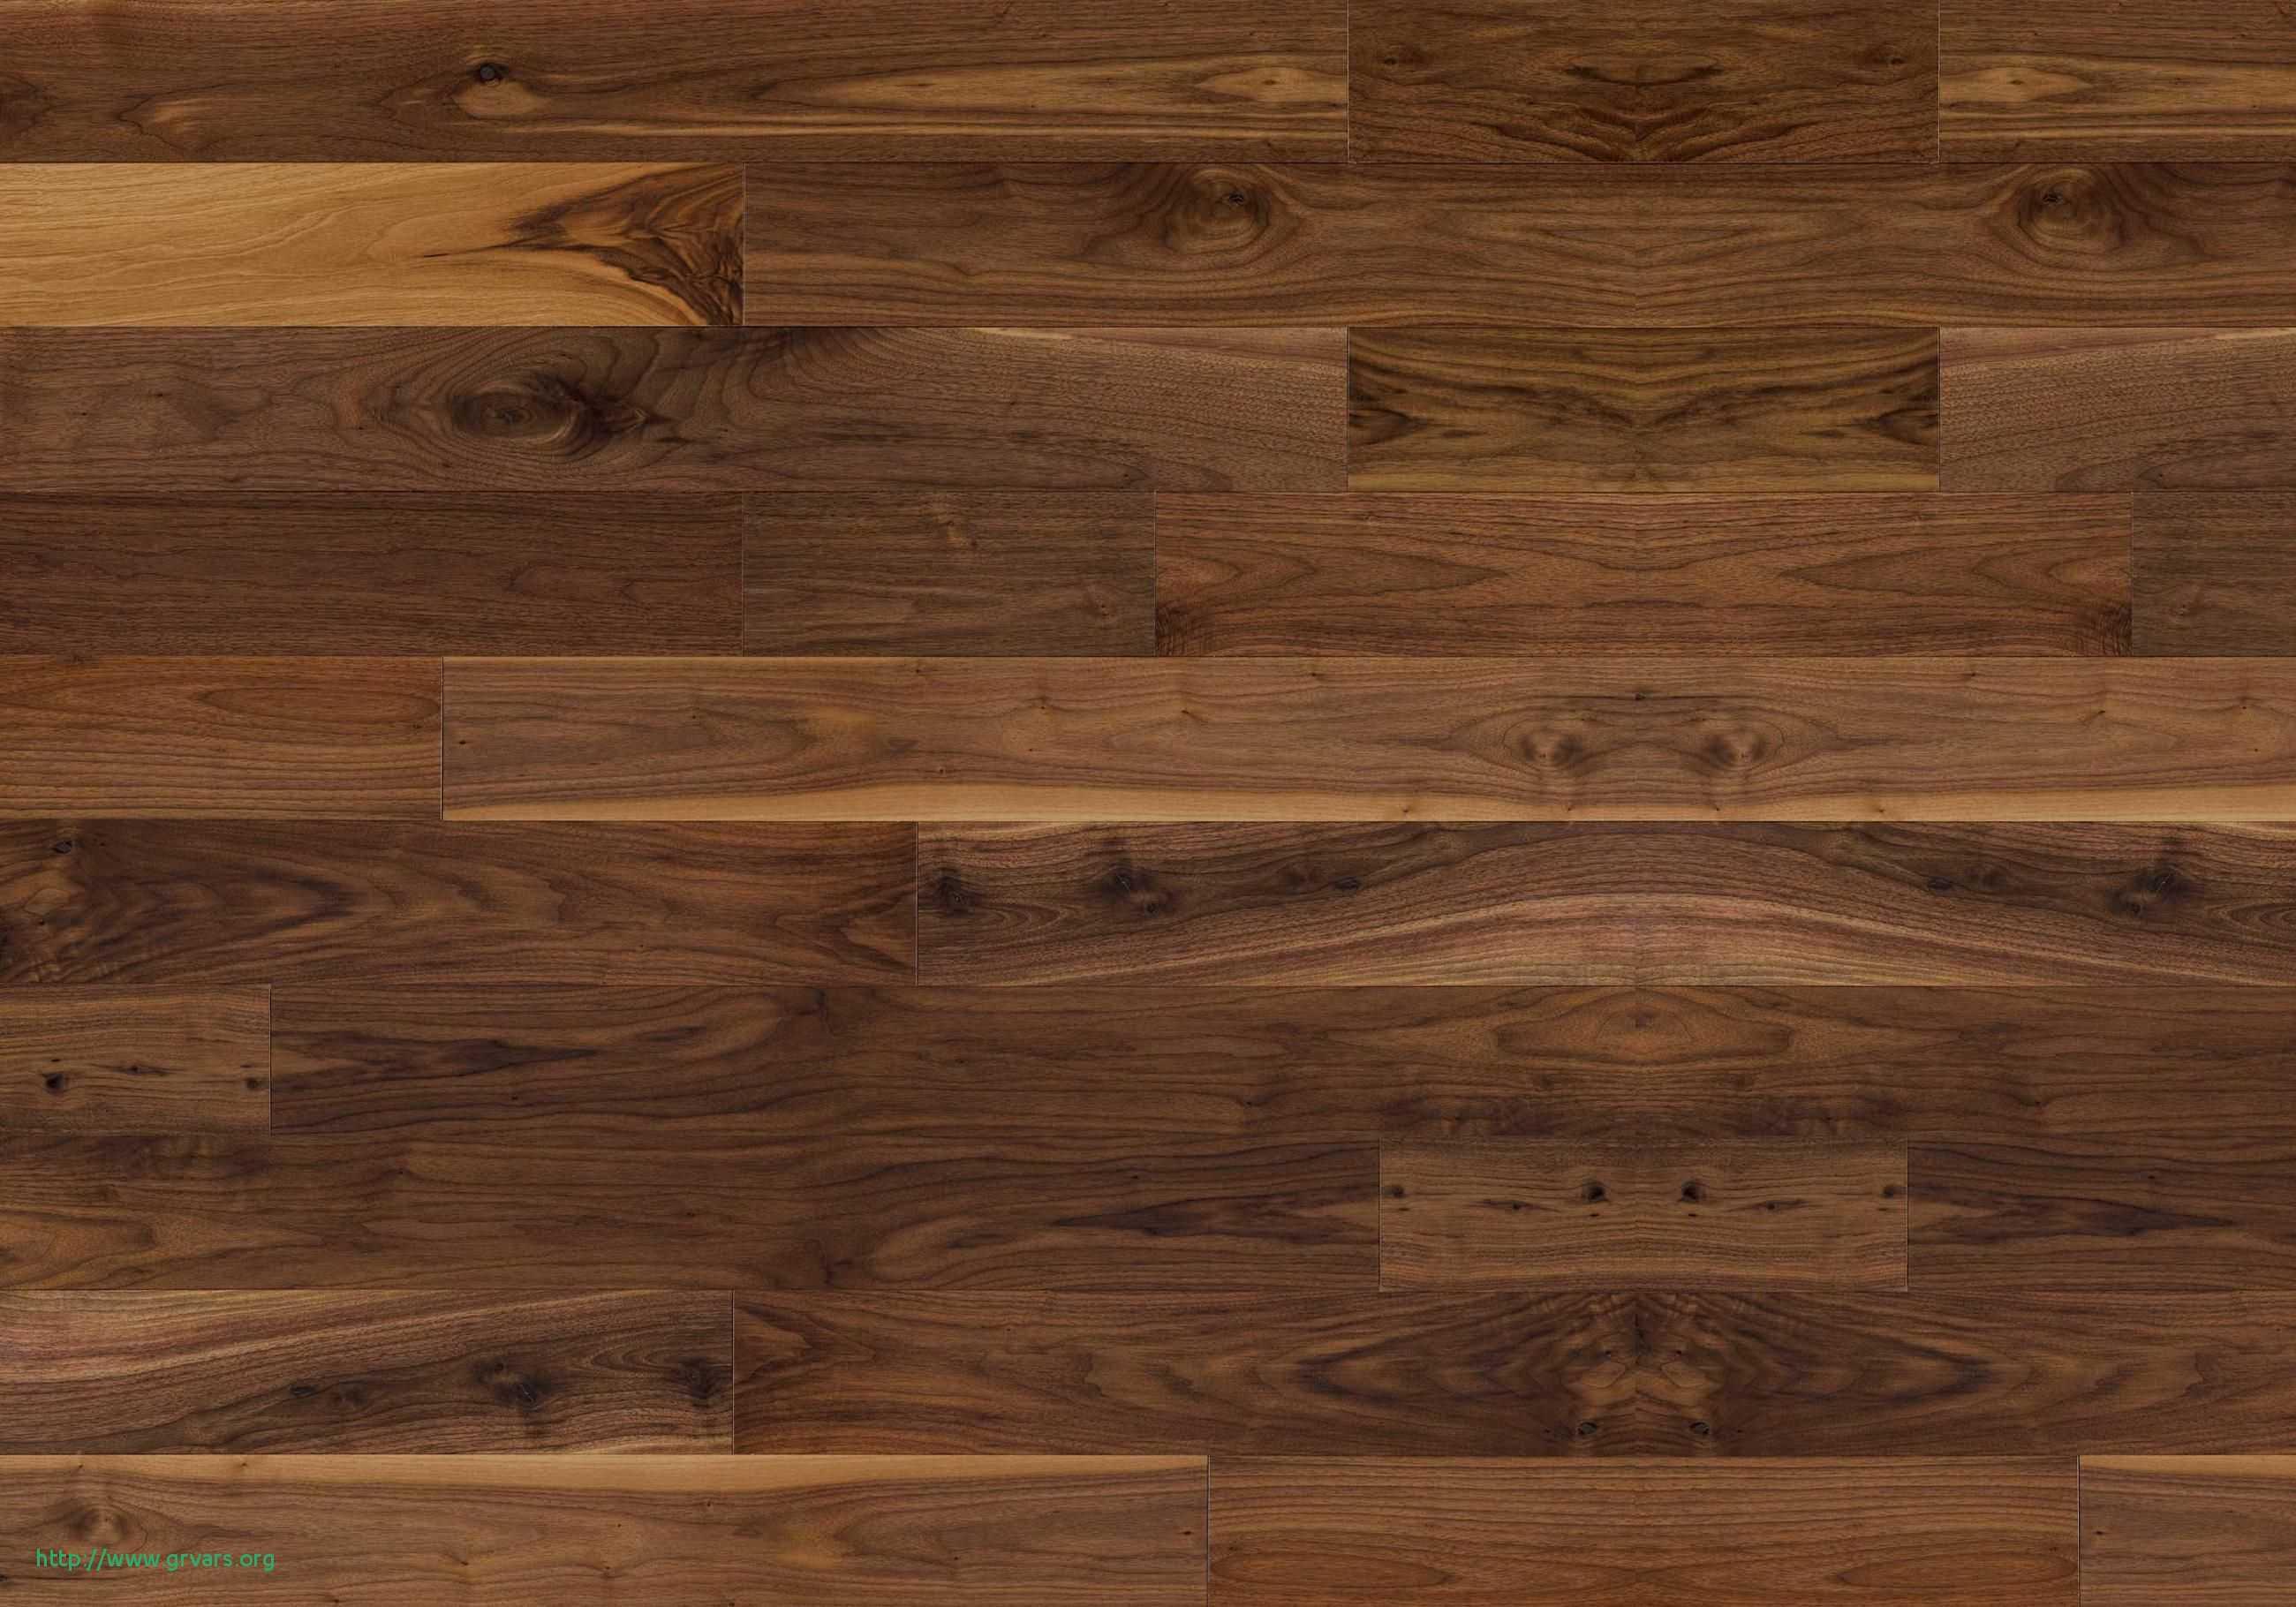 19 Stylish Hardwood Floor Expansion Gap Unique Flooring Ideas